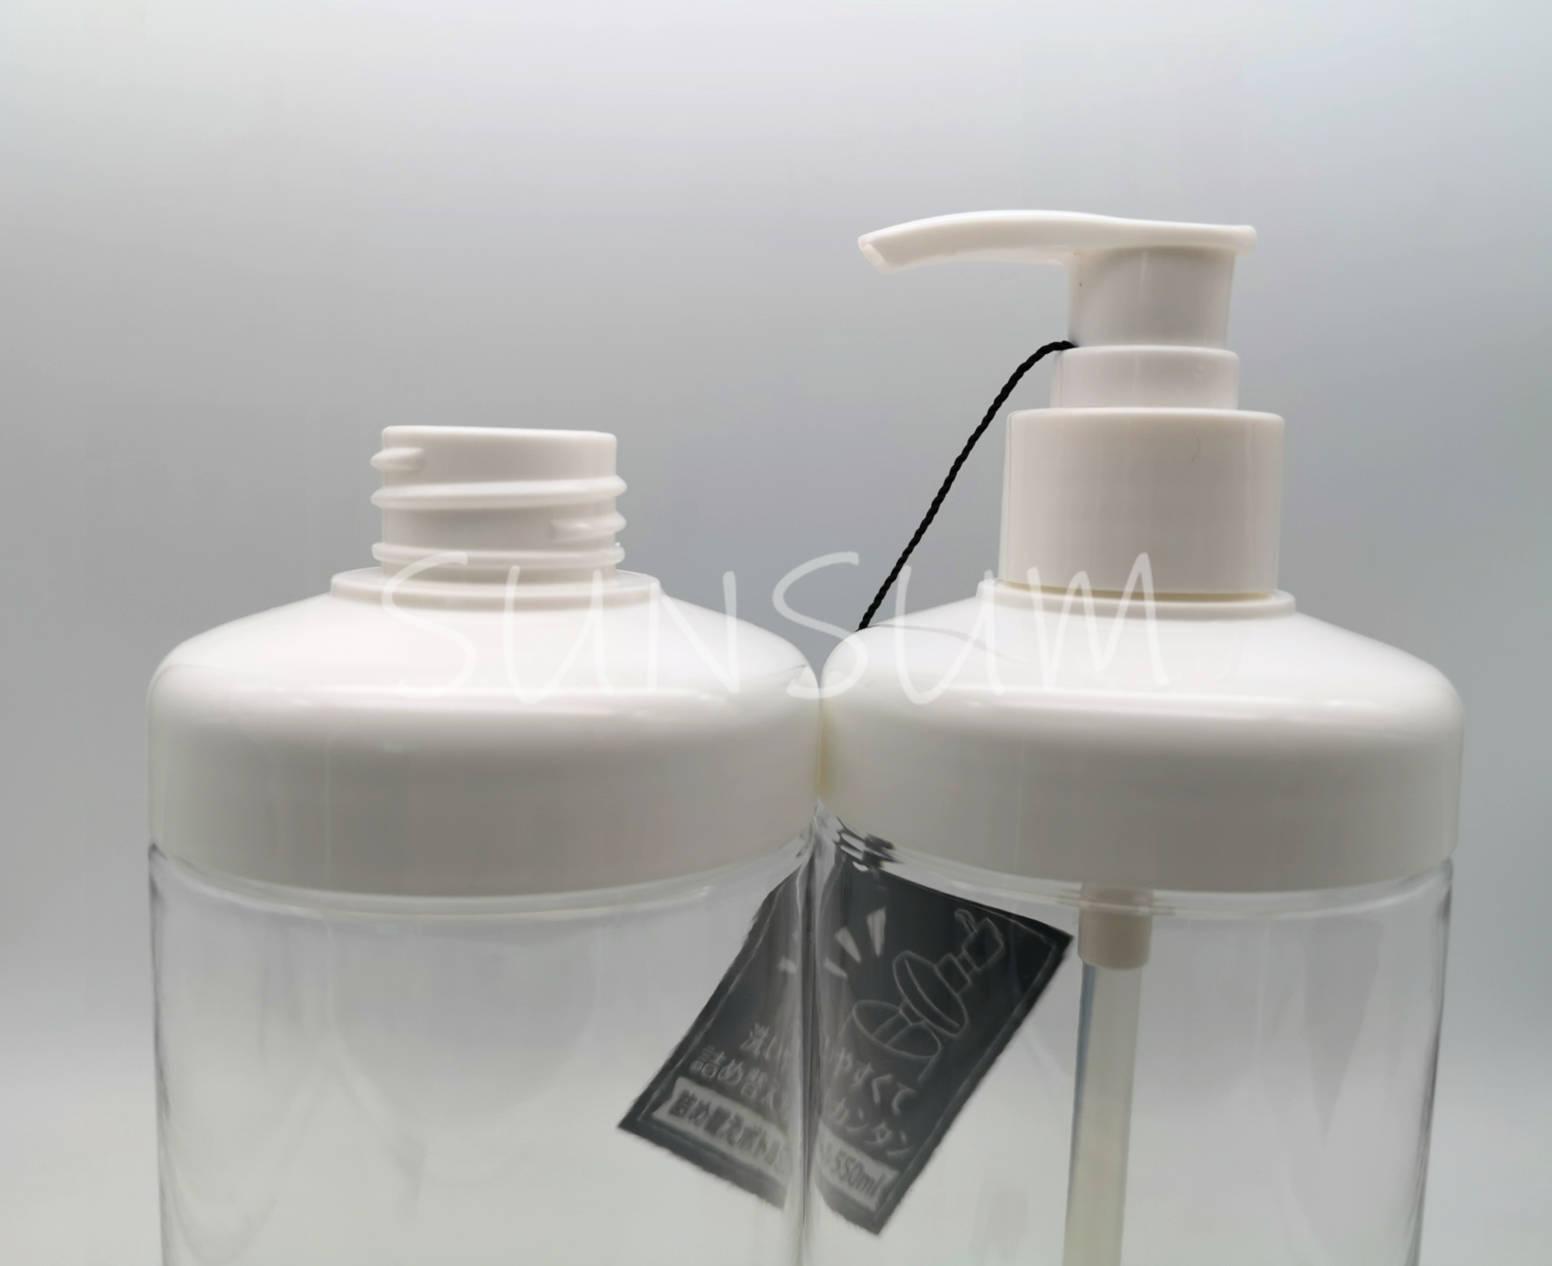 500ml shampoo bottle with pump